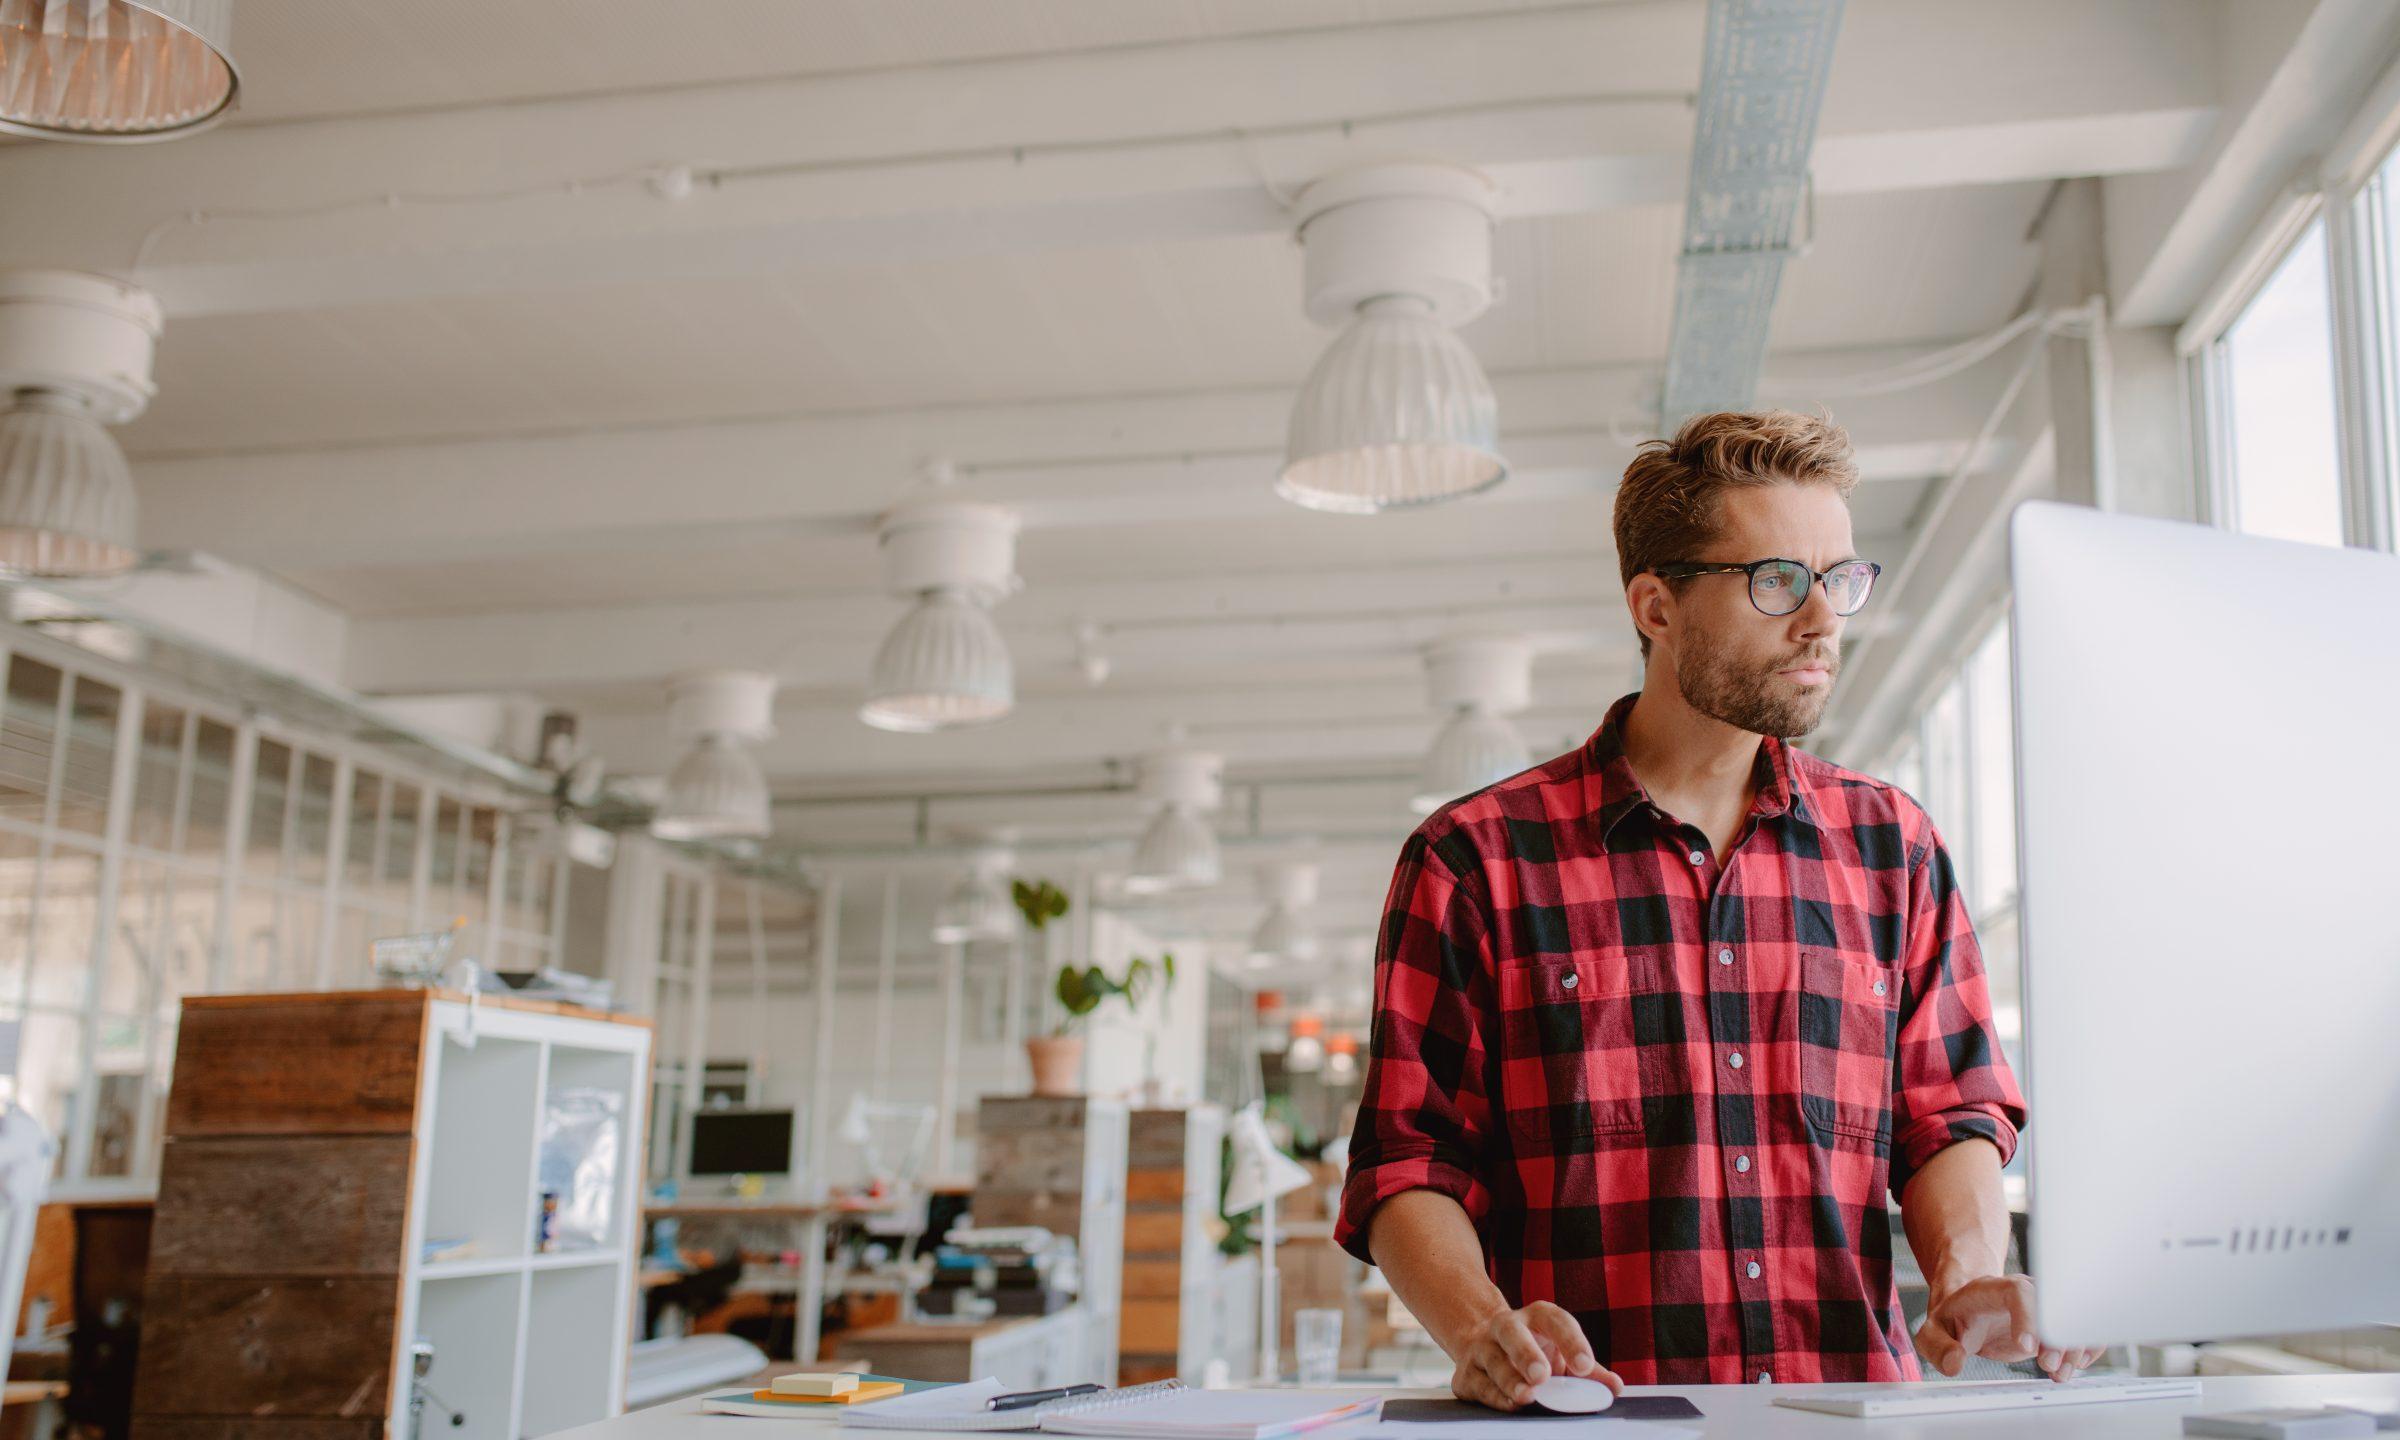 Backed Personal Loan Alternatives